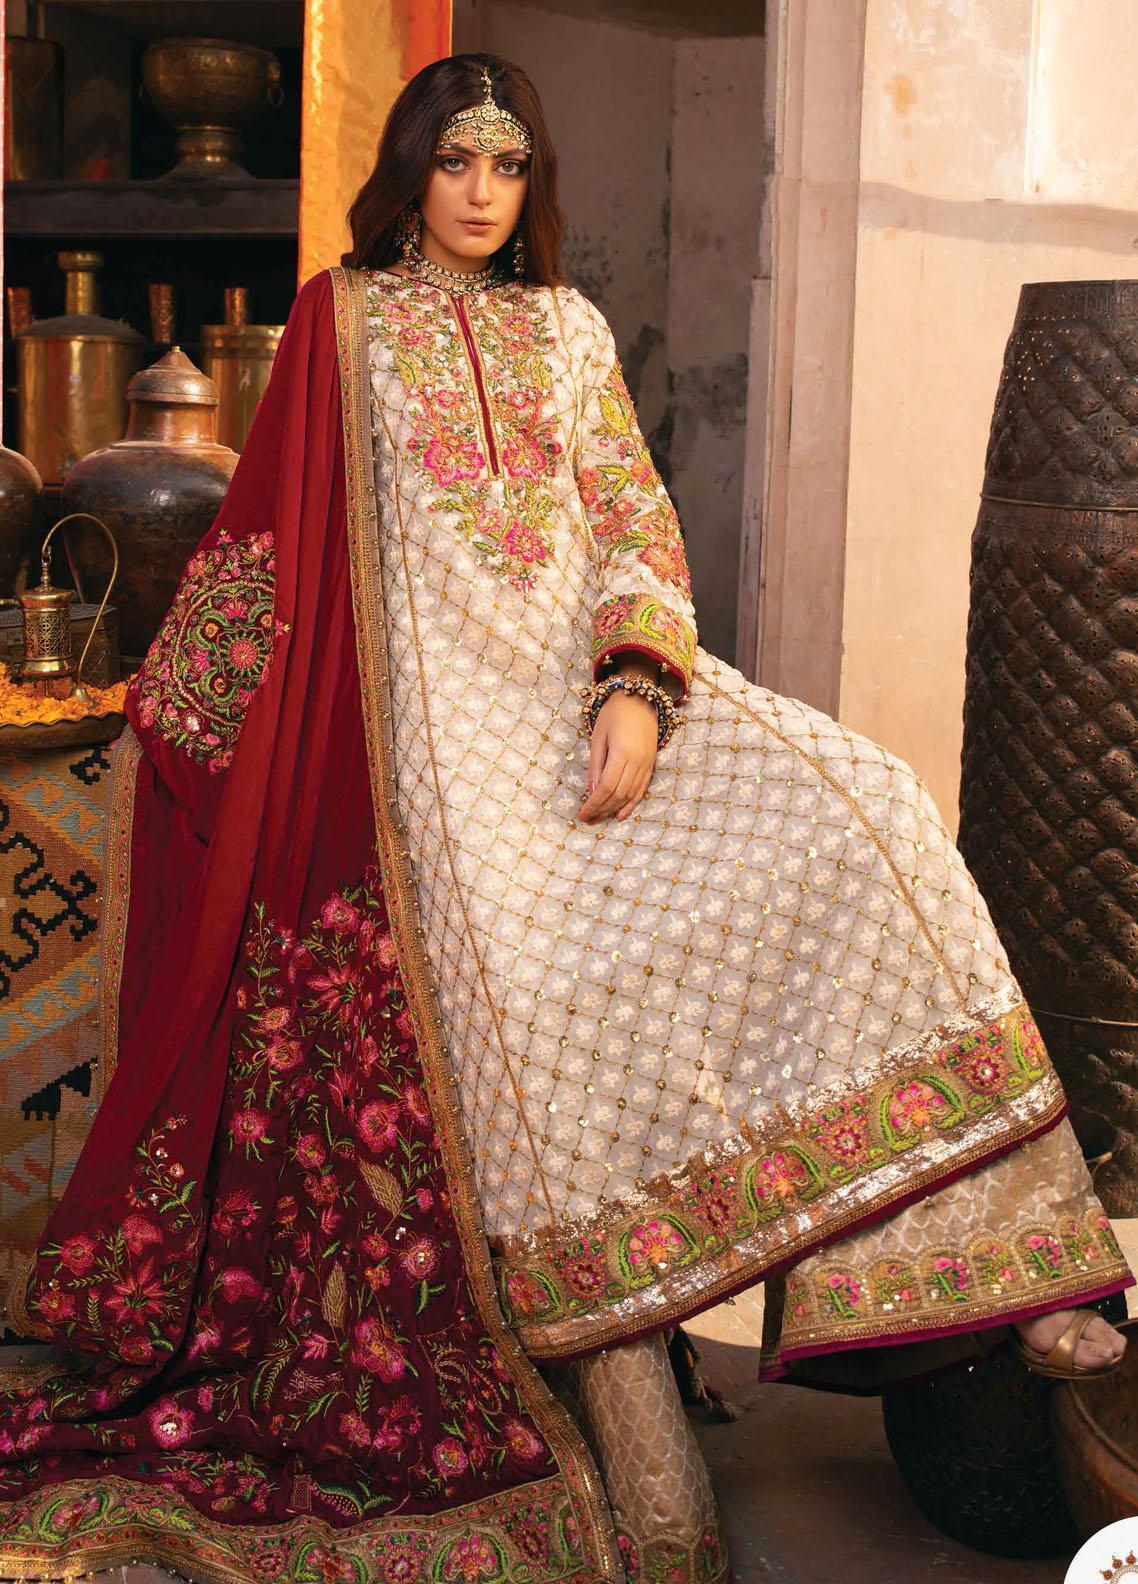 Rang Rasiya RR21HC 02 Heritage Collectables - The Wedding Series Fahad Hussyan